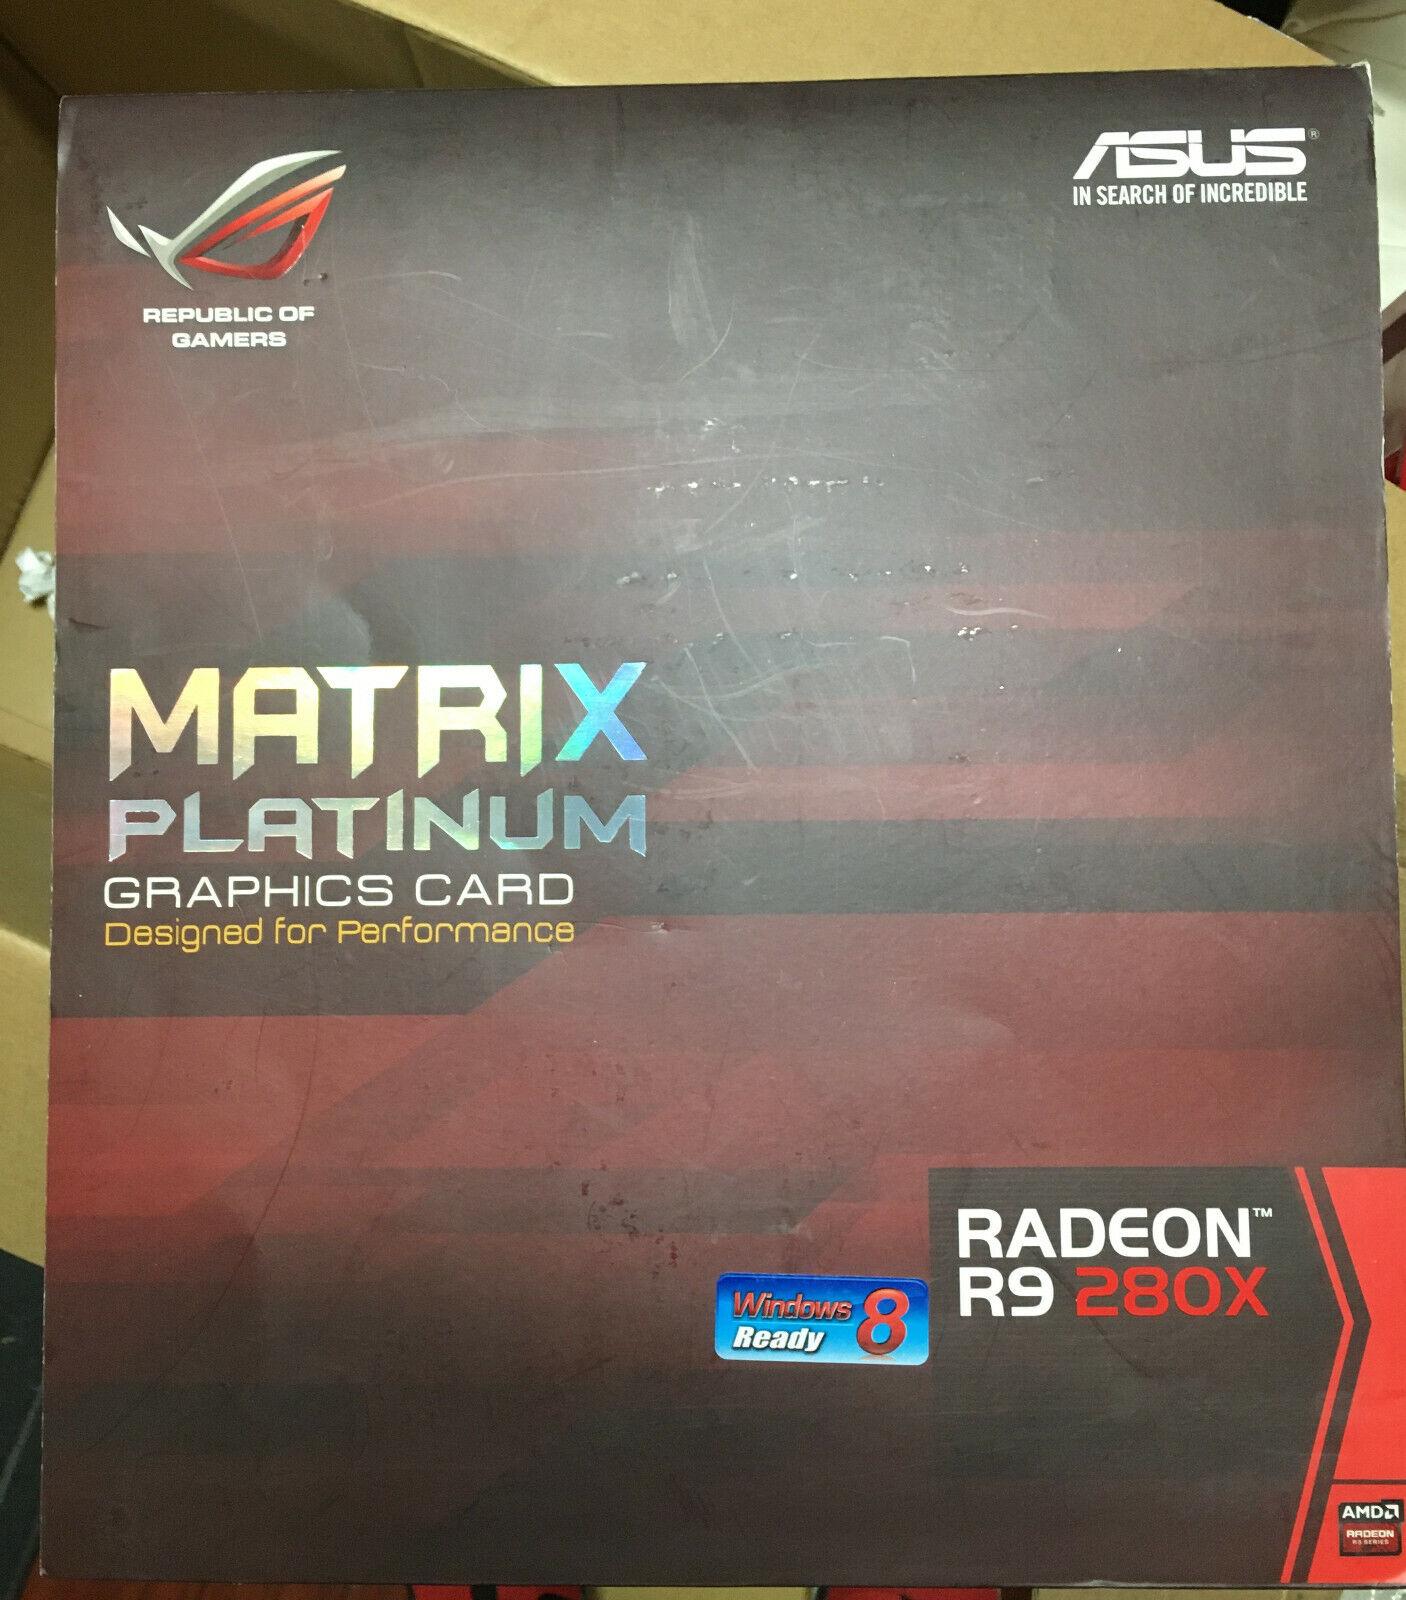 *ASUS_AMD Radeon R9 280X Matrix Platinum 3GB Gaming Graphic Card_New*